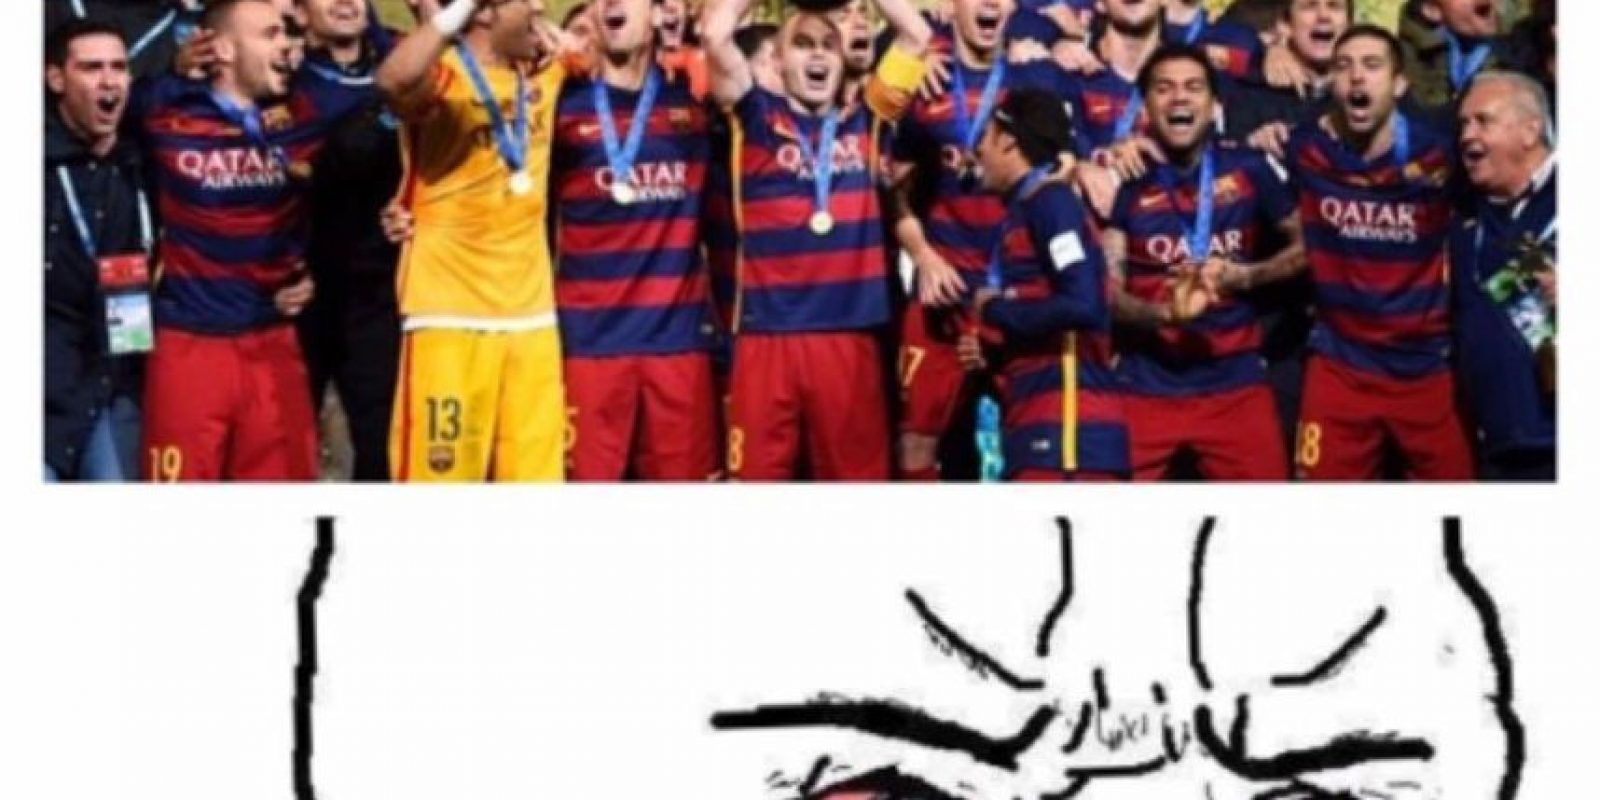 Foto:Fútbol Bullying